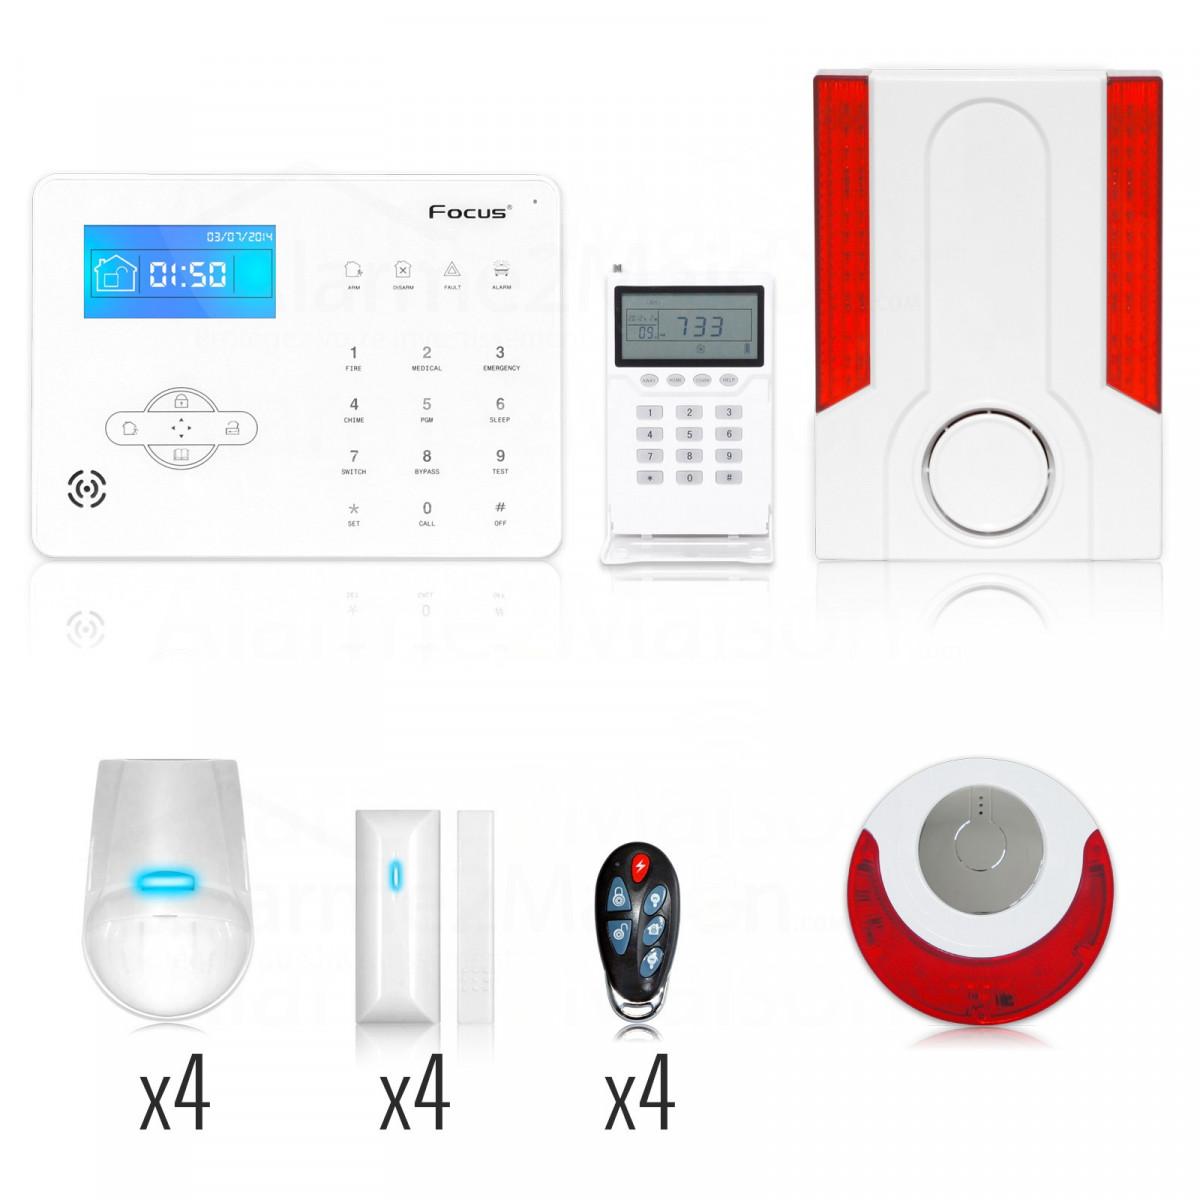 alarme maison sans fil focus gsm rtc 5 6 pi ces 2 sir nes d port es. Black Bedroom Furniture Sets. Home Design Ideas